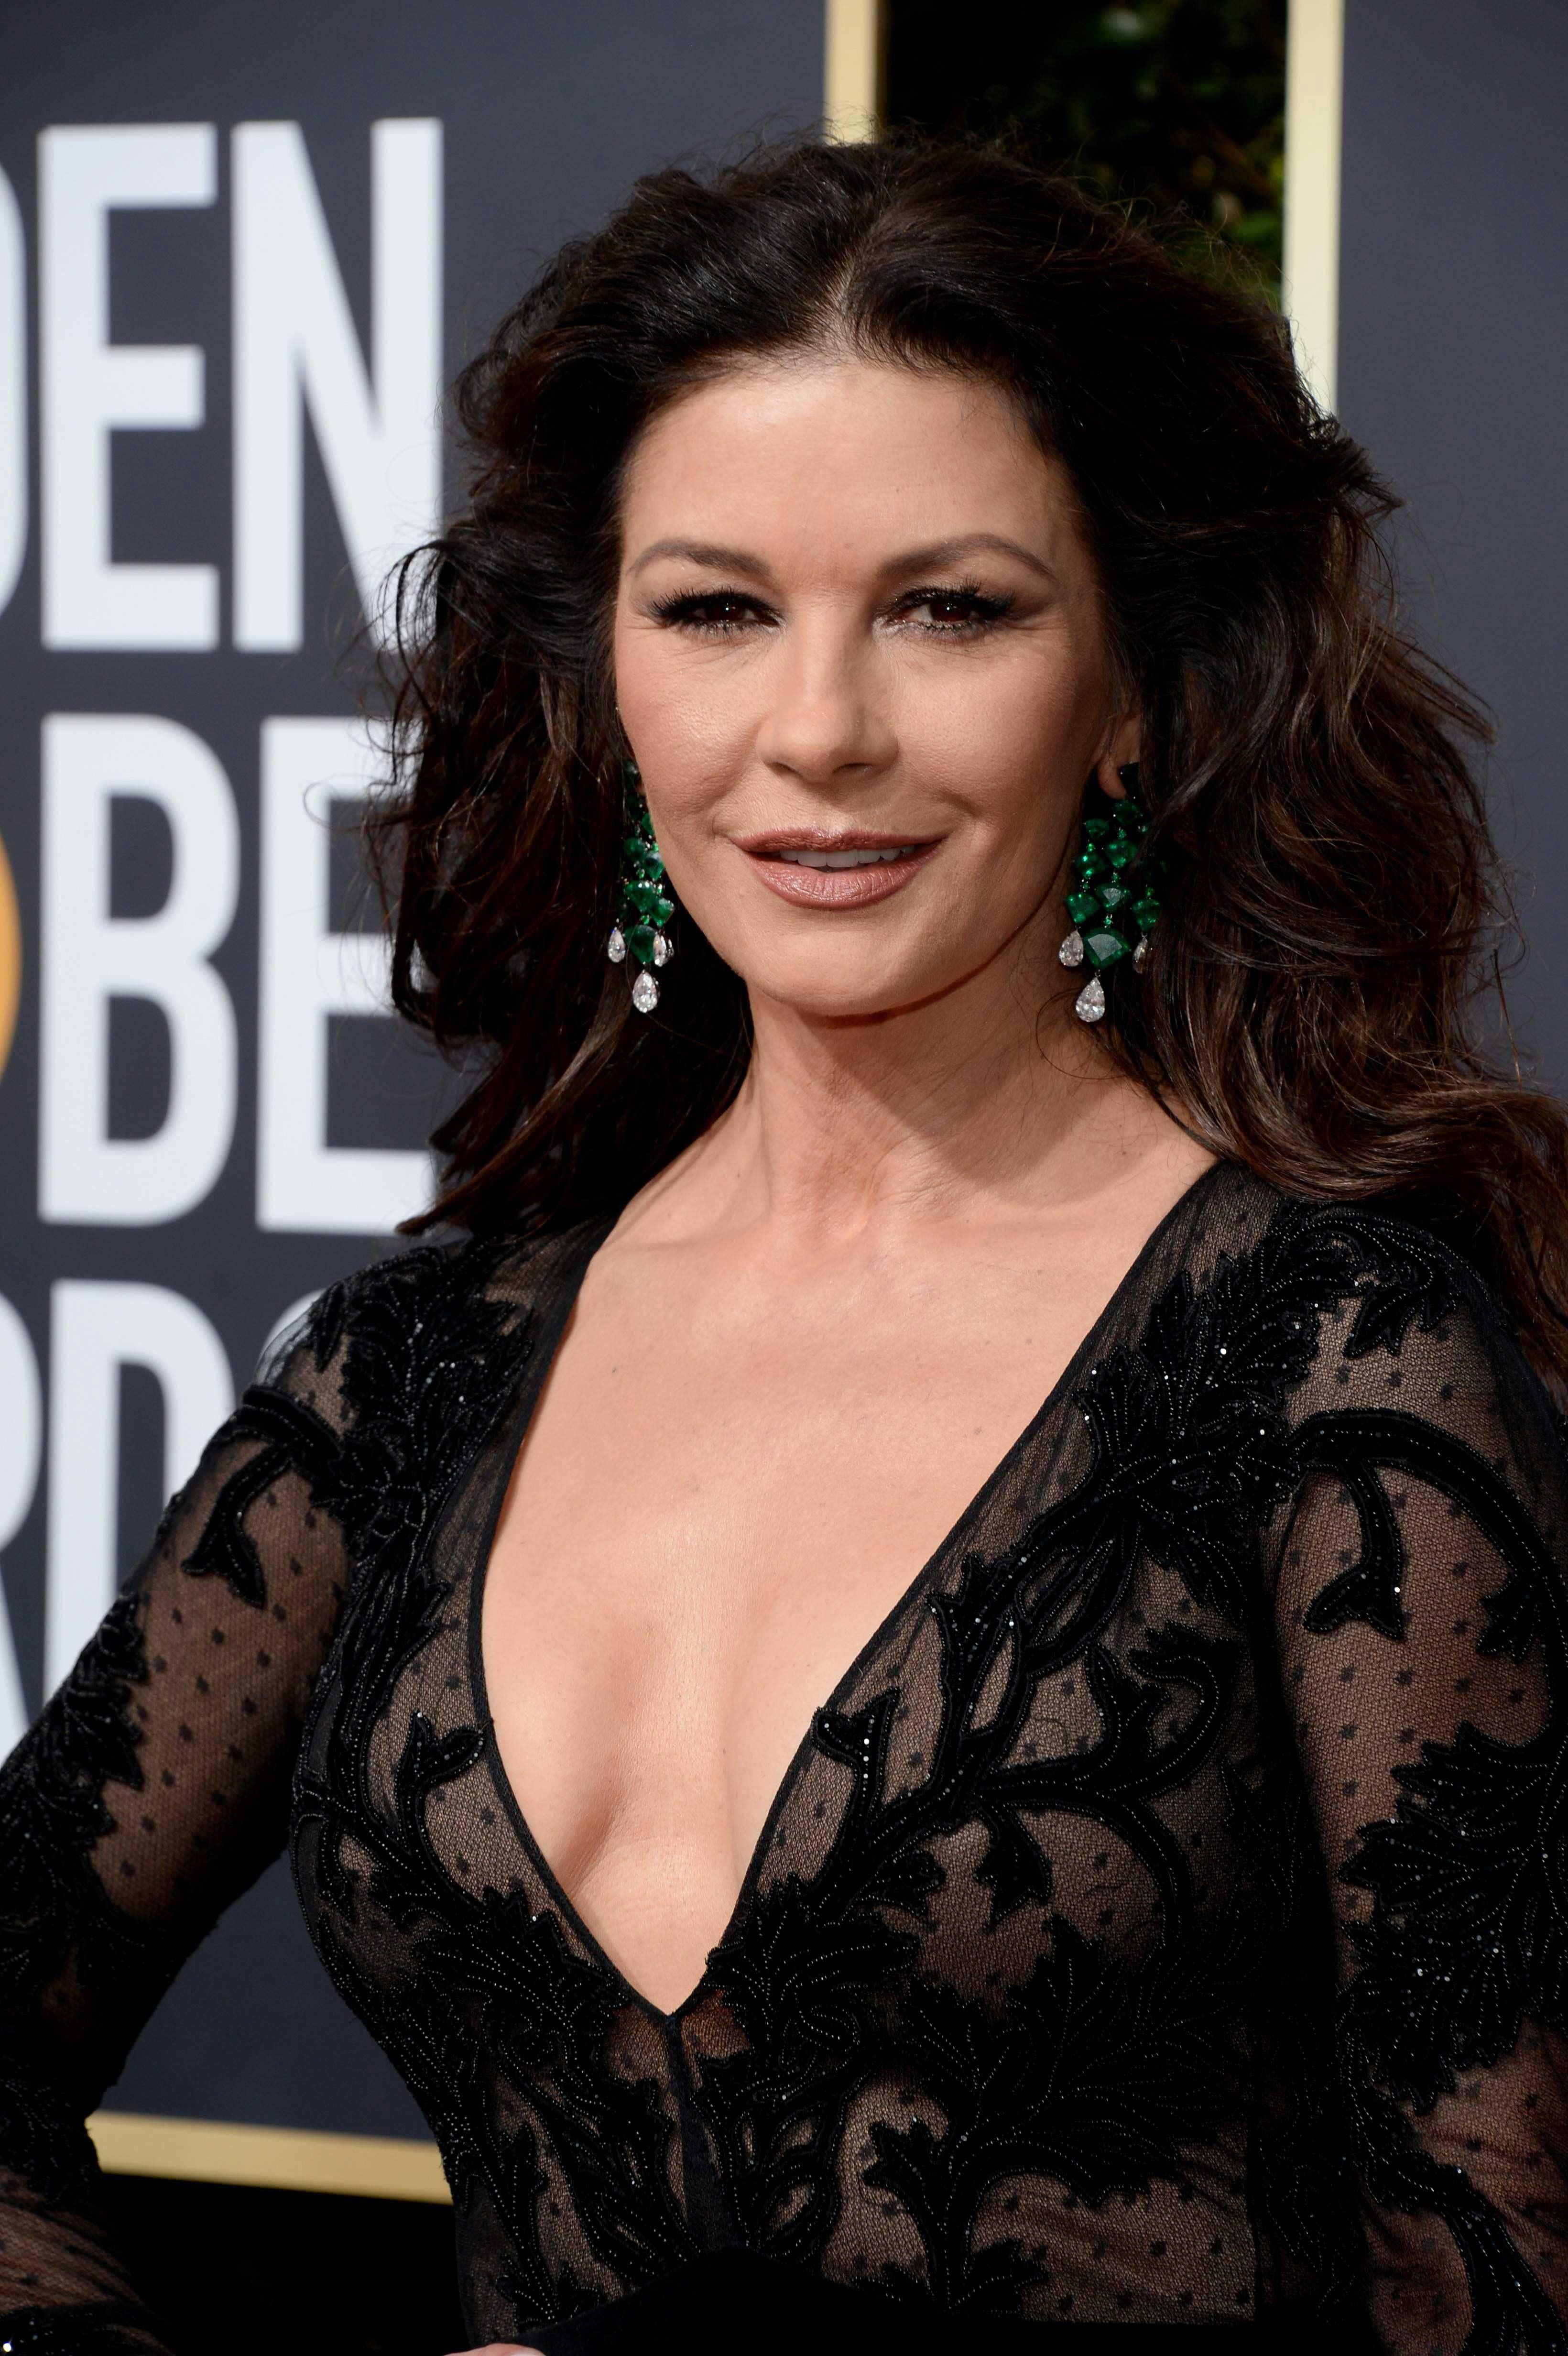 Catherine Zeta-Jones :: Celebrity Movie Archive